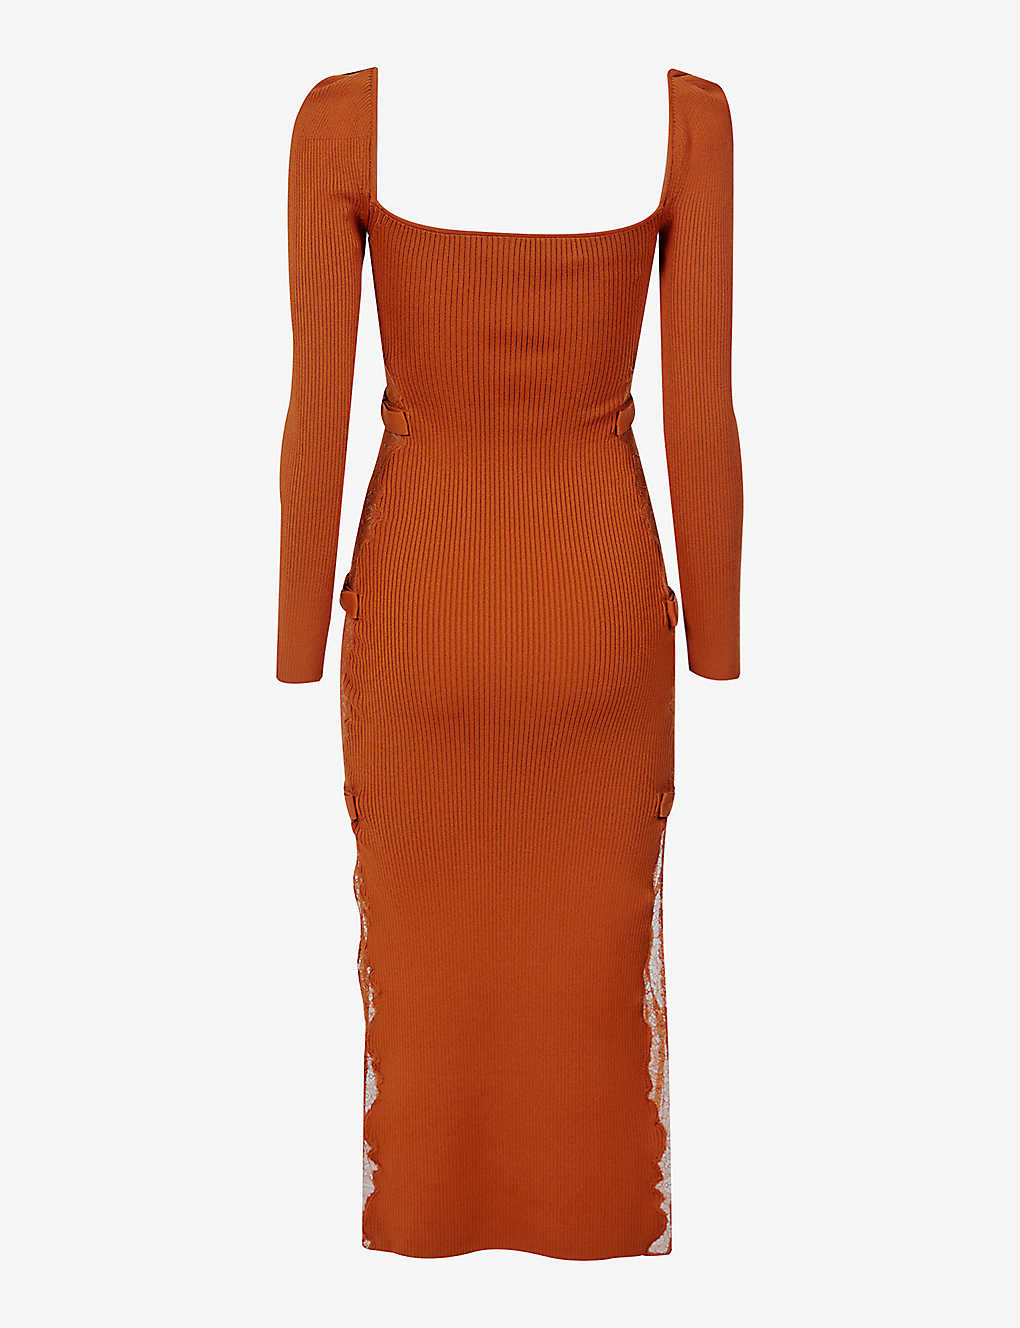 Self Portait Sweetheart-neckline stretch-knit midi dress back view